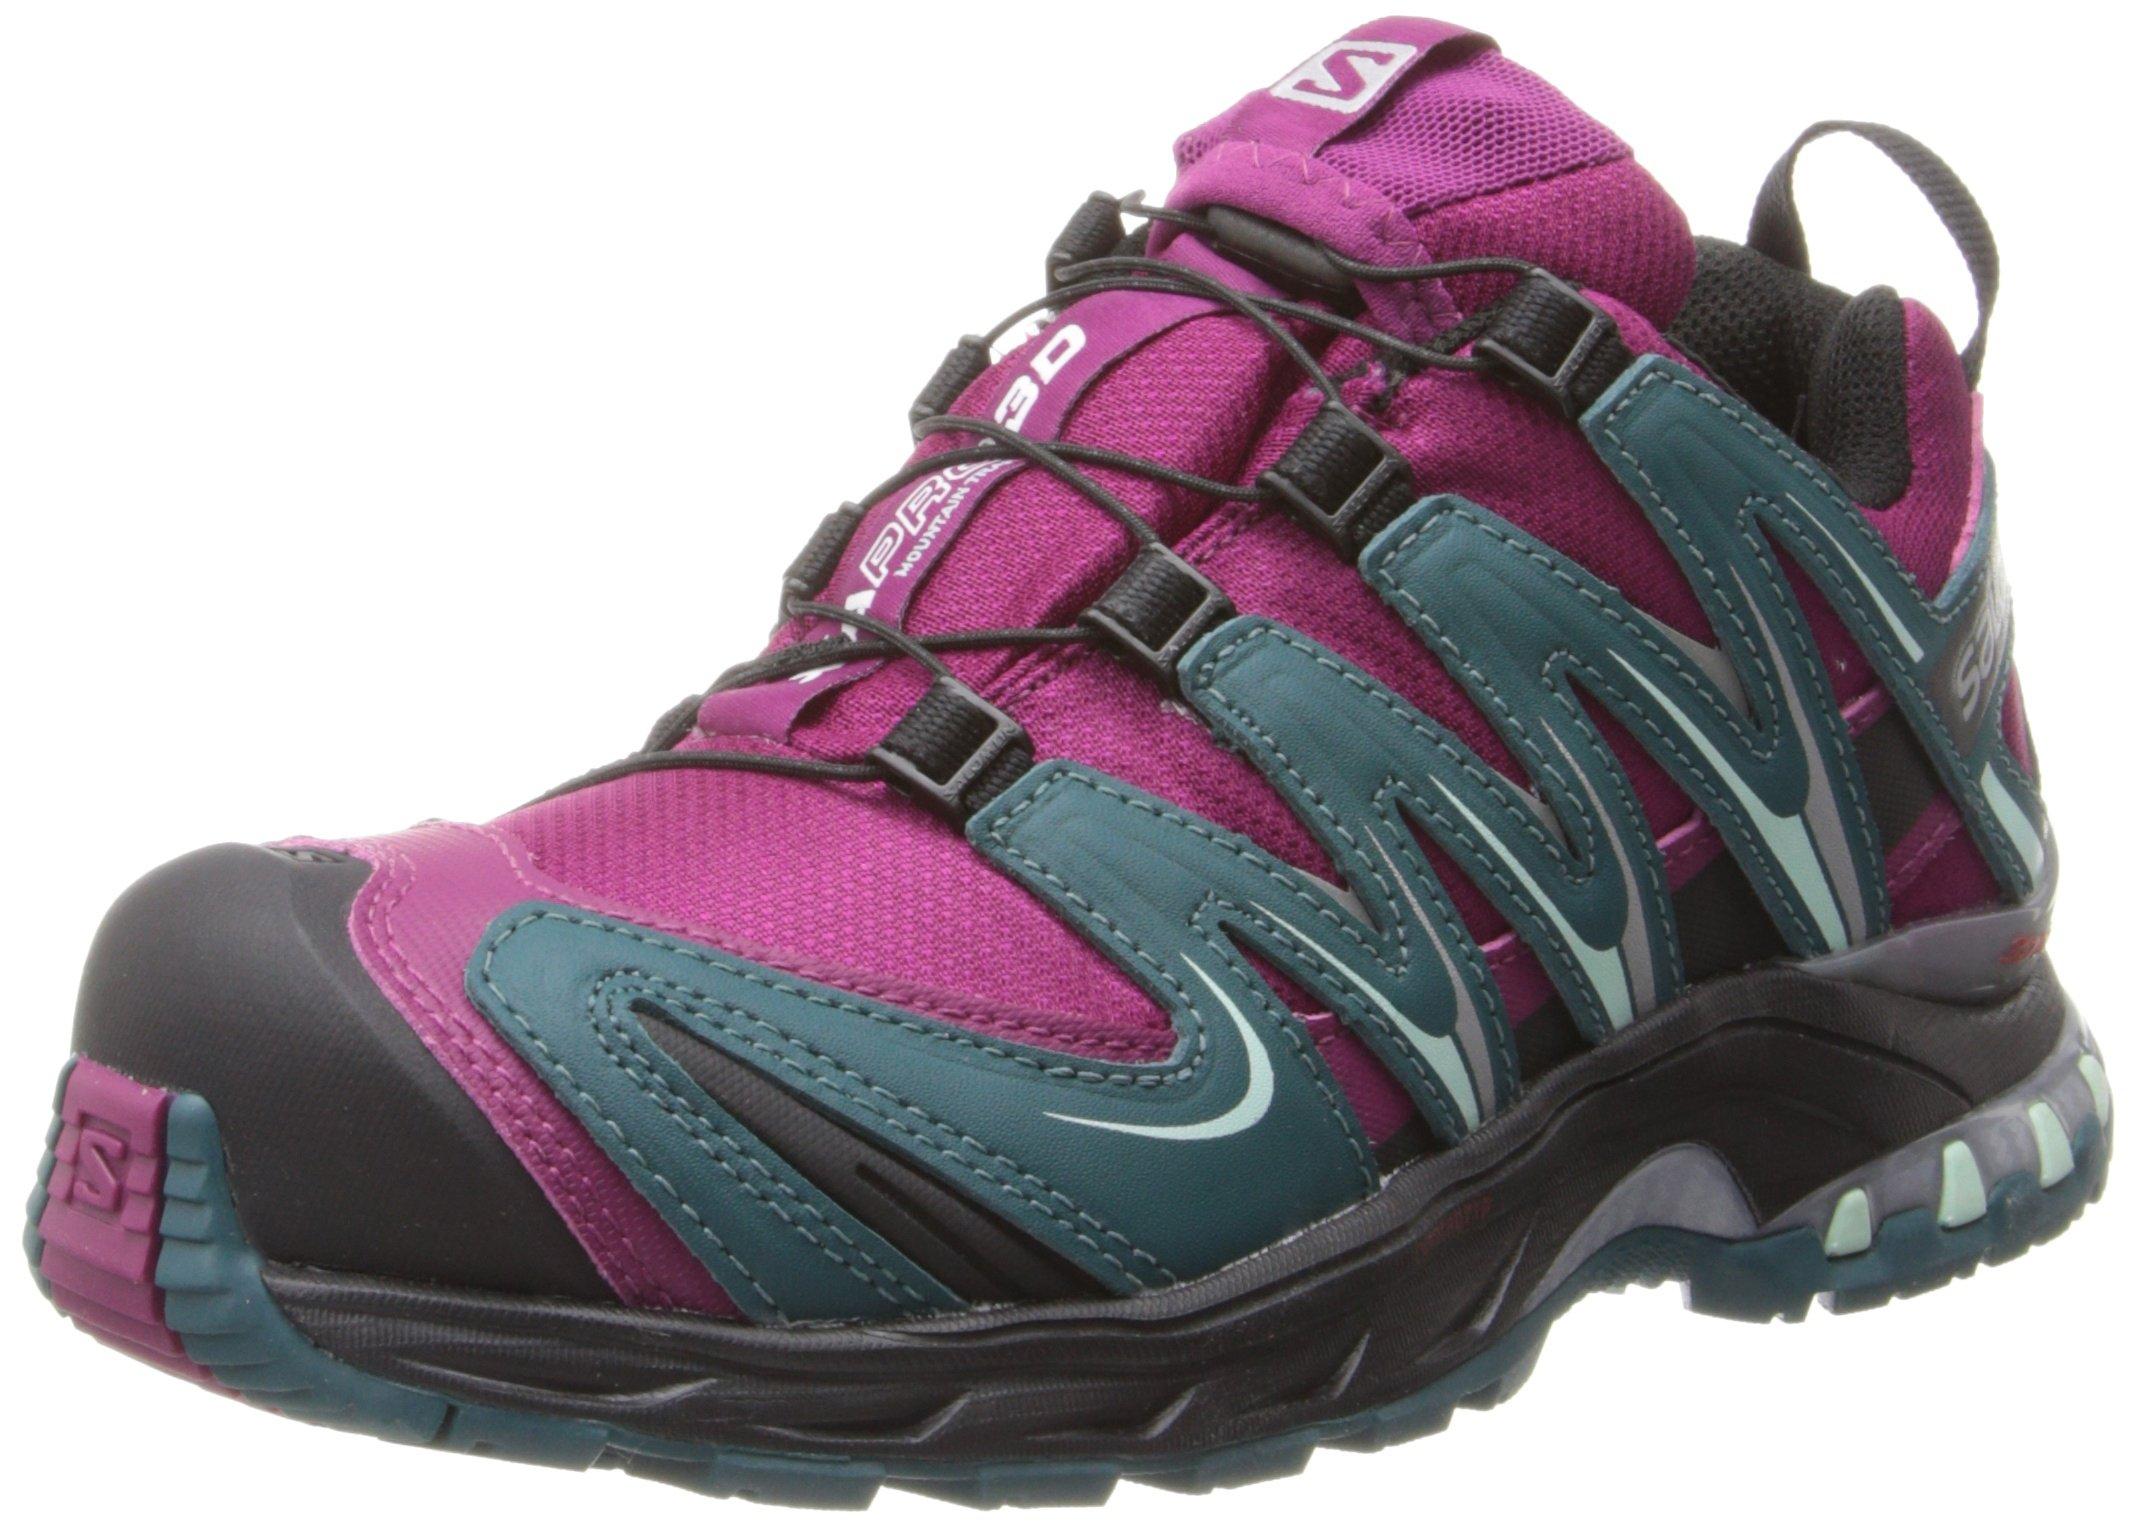 81l7CEc0SpL - SALOMON Women's XA PRO 3D CS WP W Trail Runner